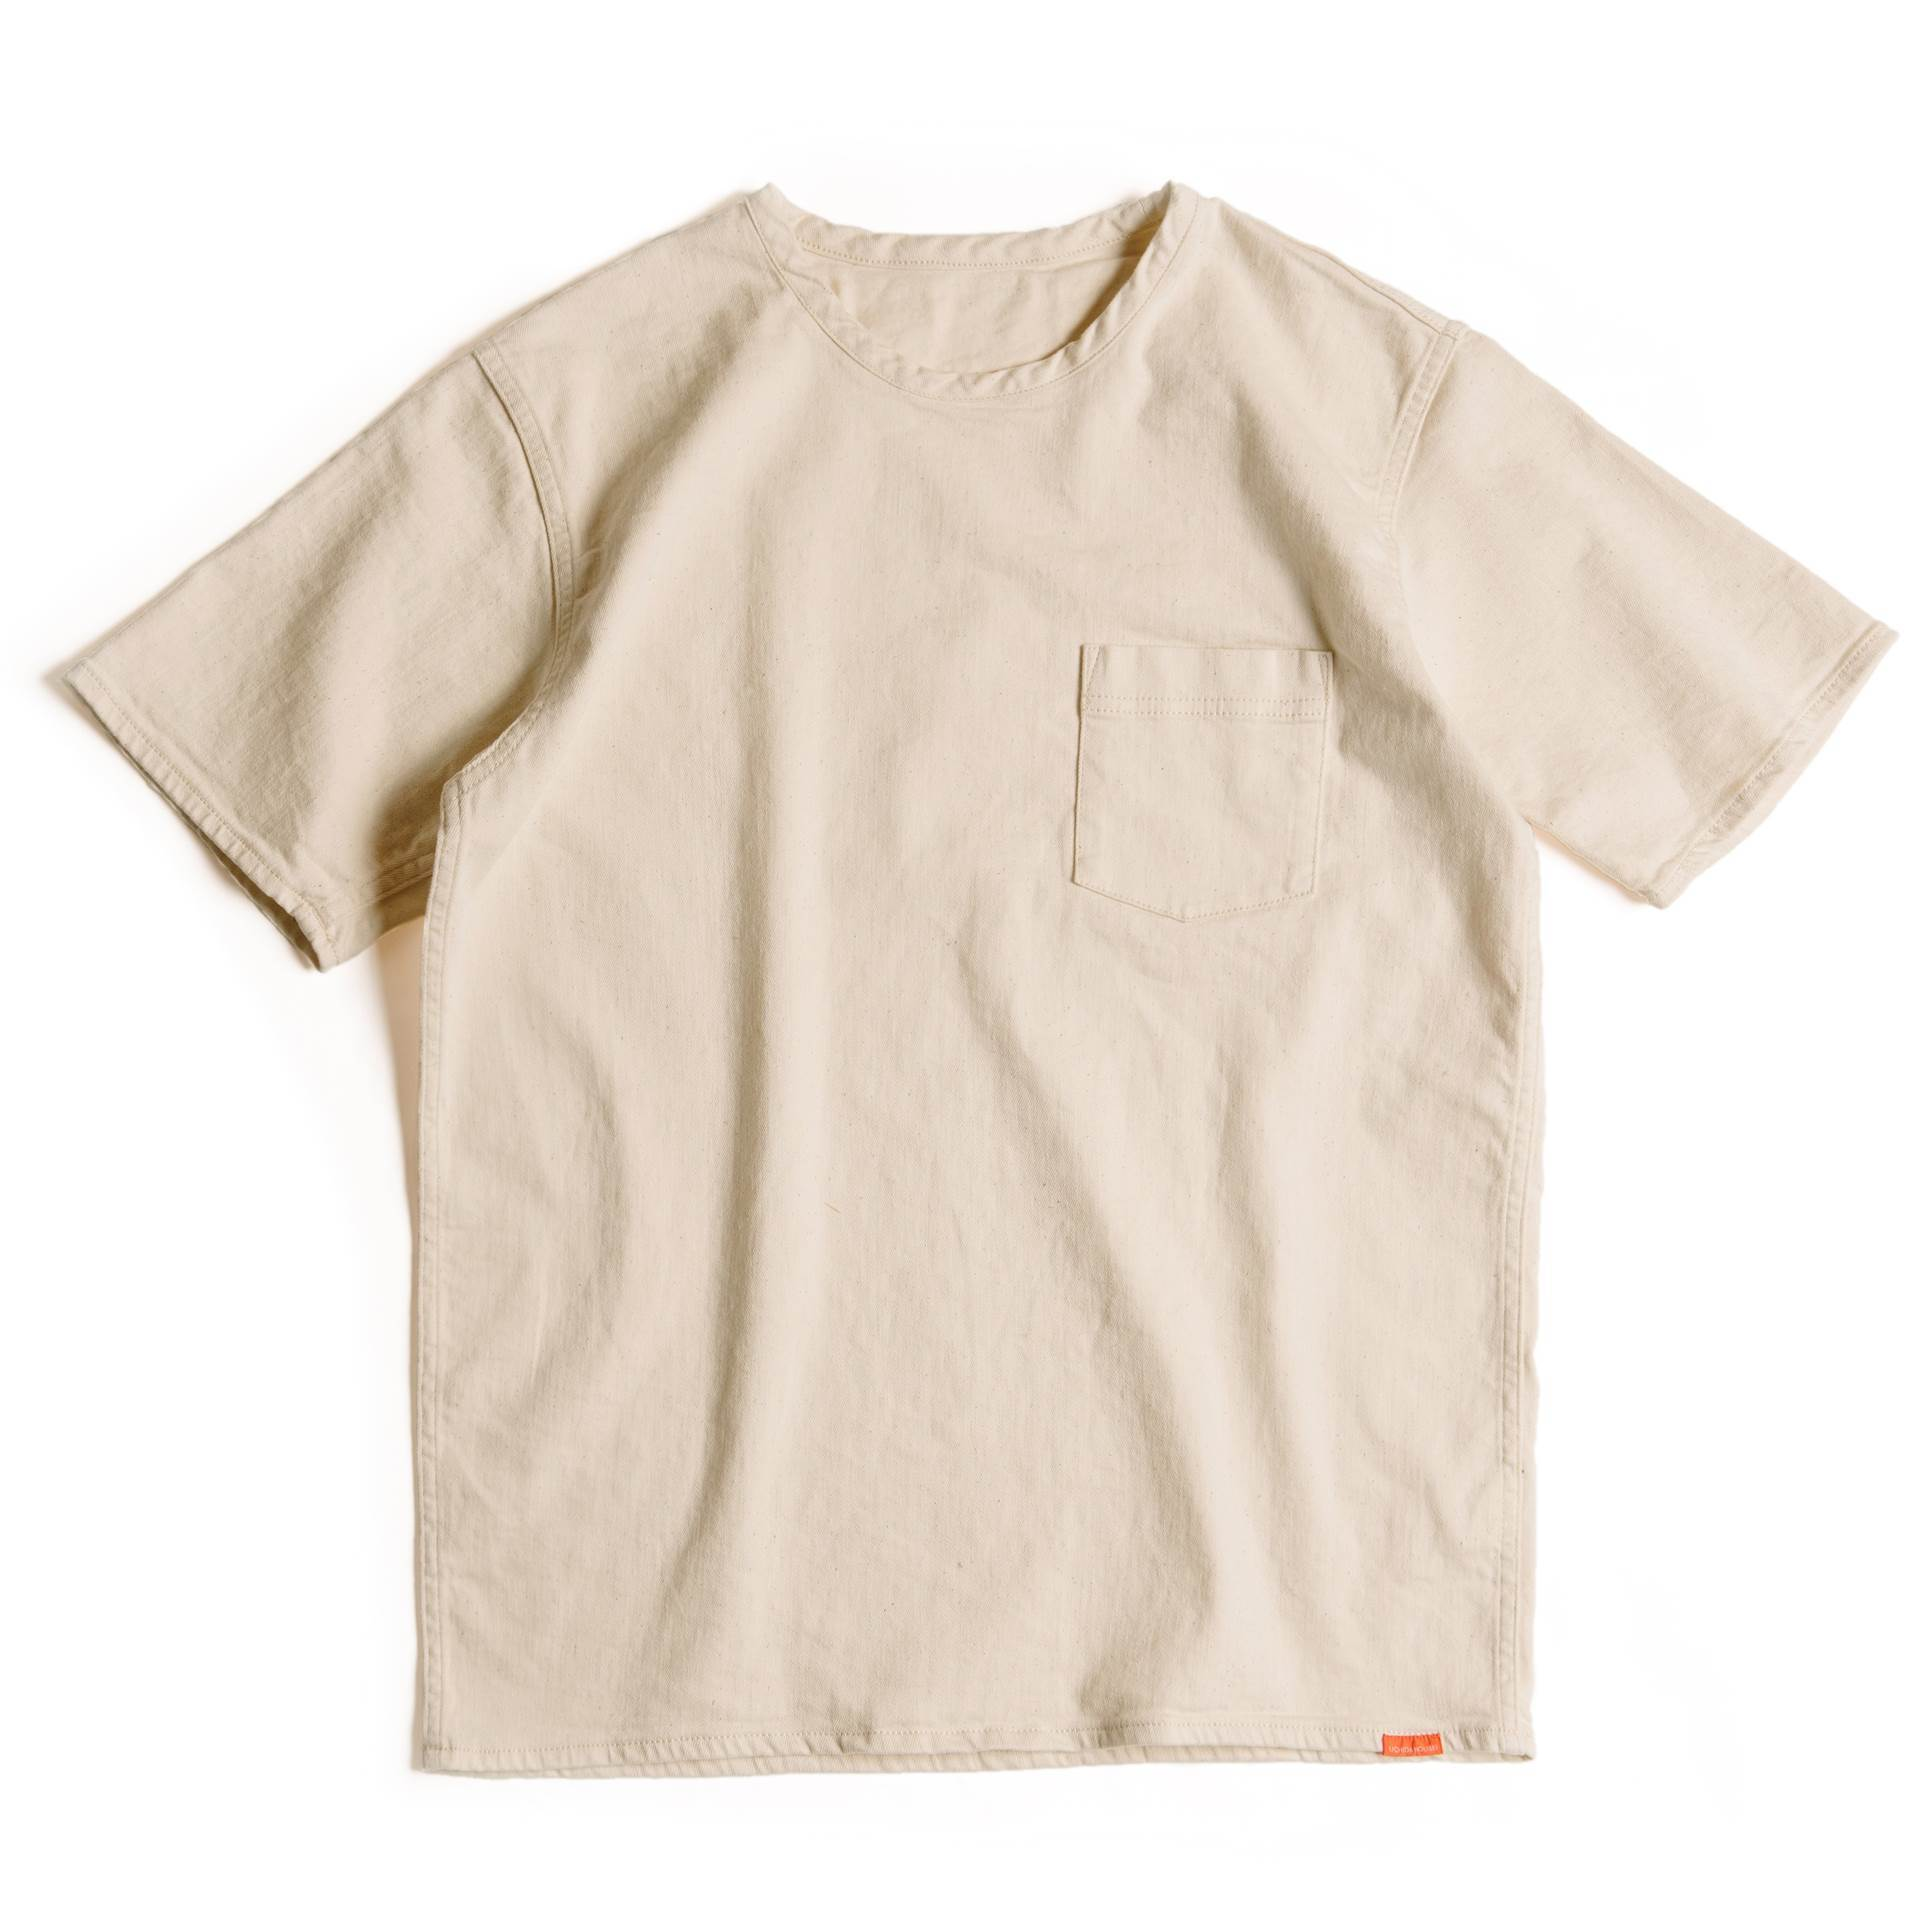 DENIM T-SHIRT 【デニムTシャツ】